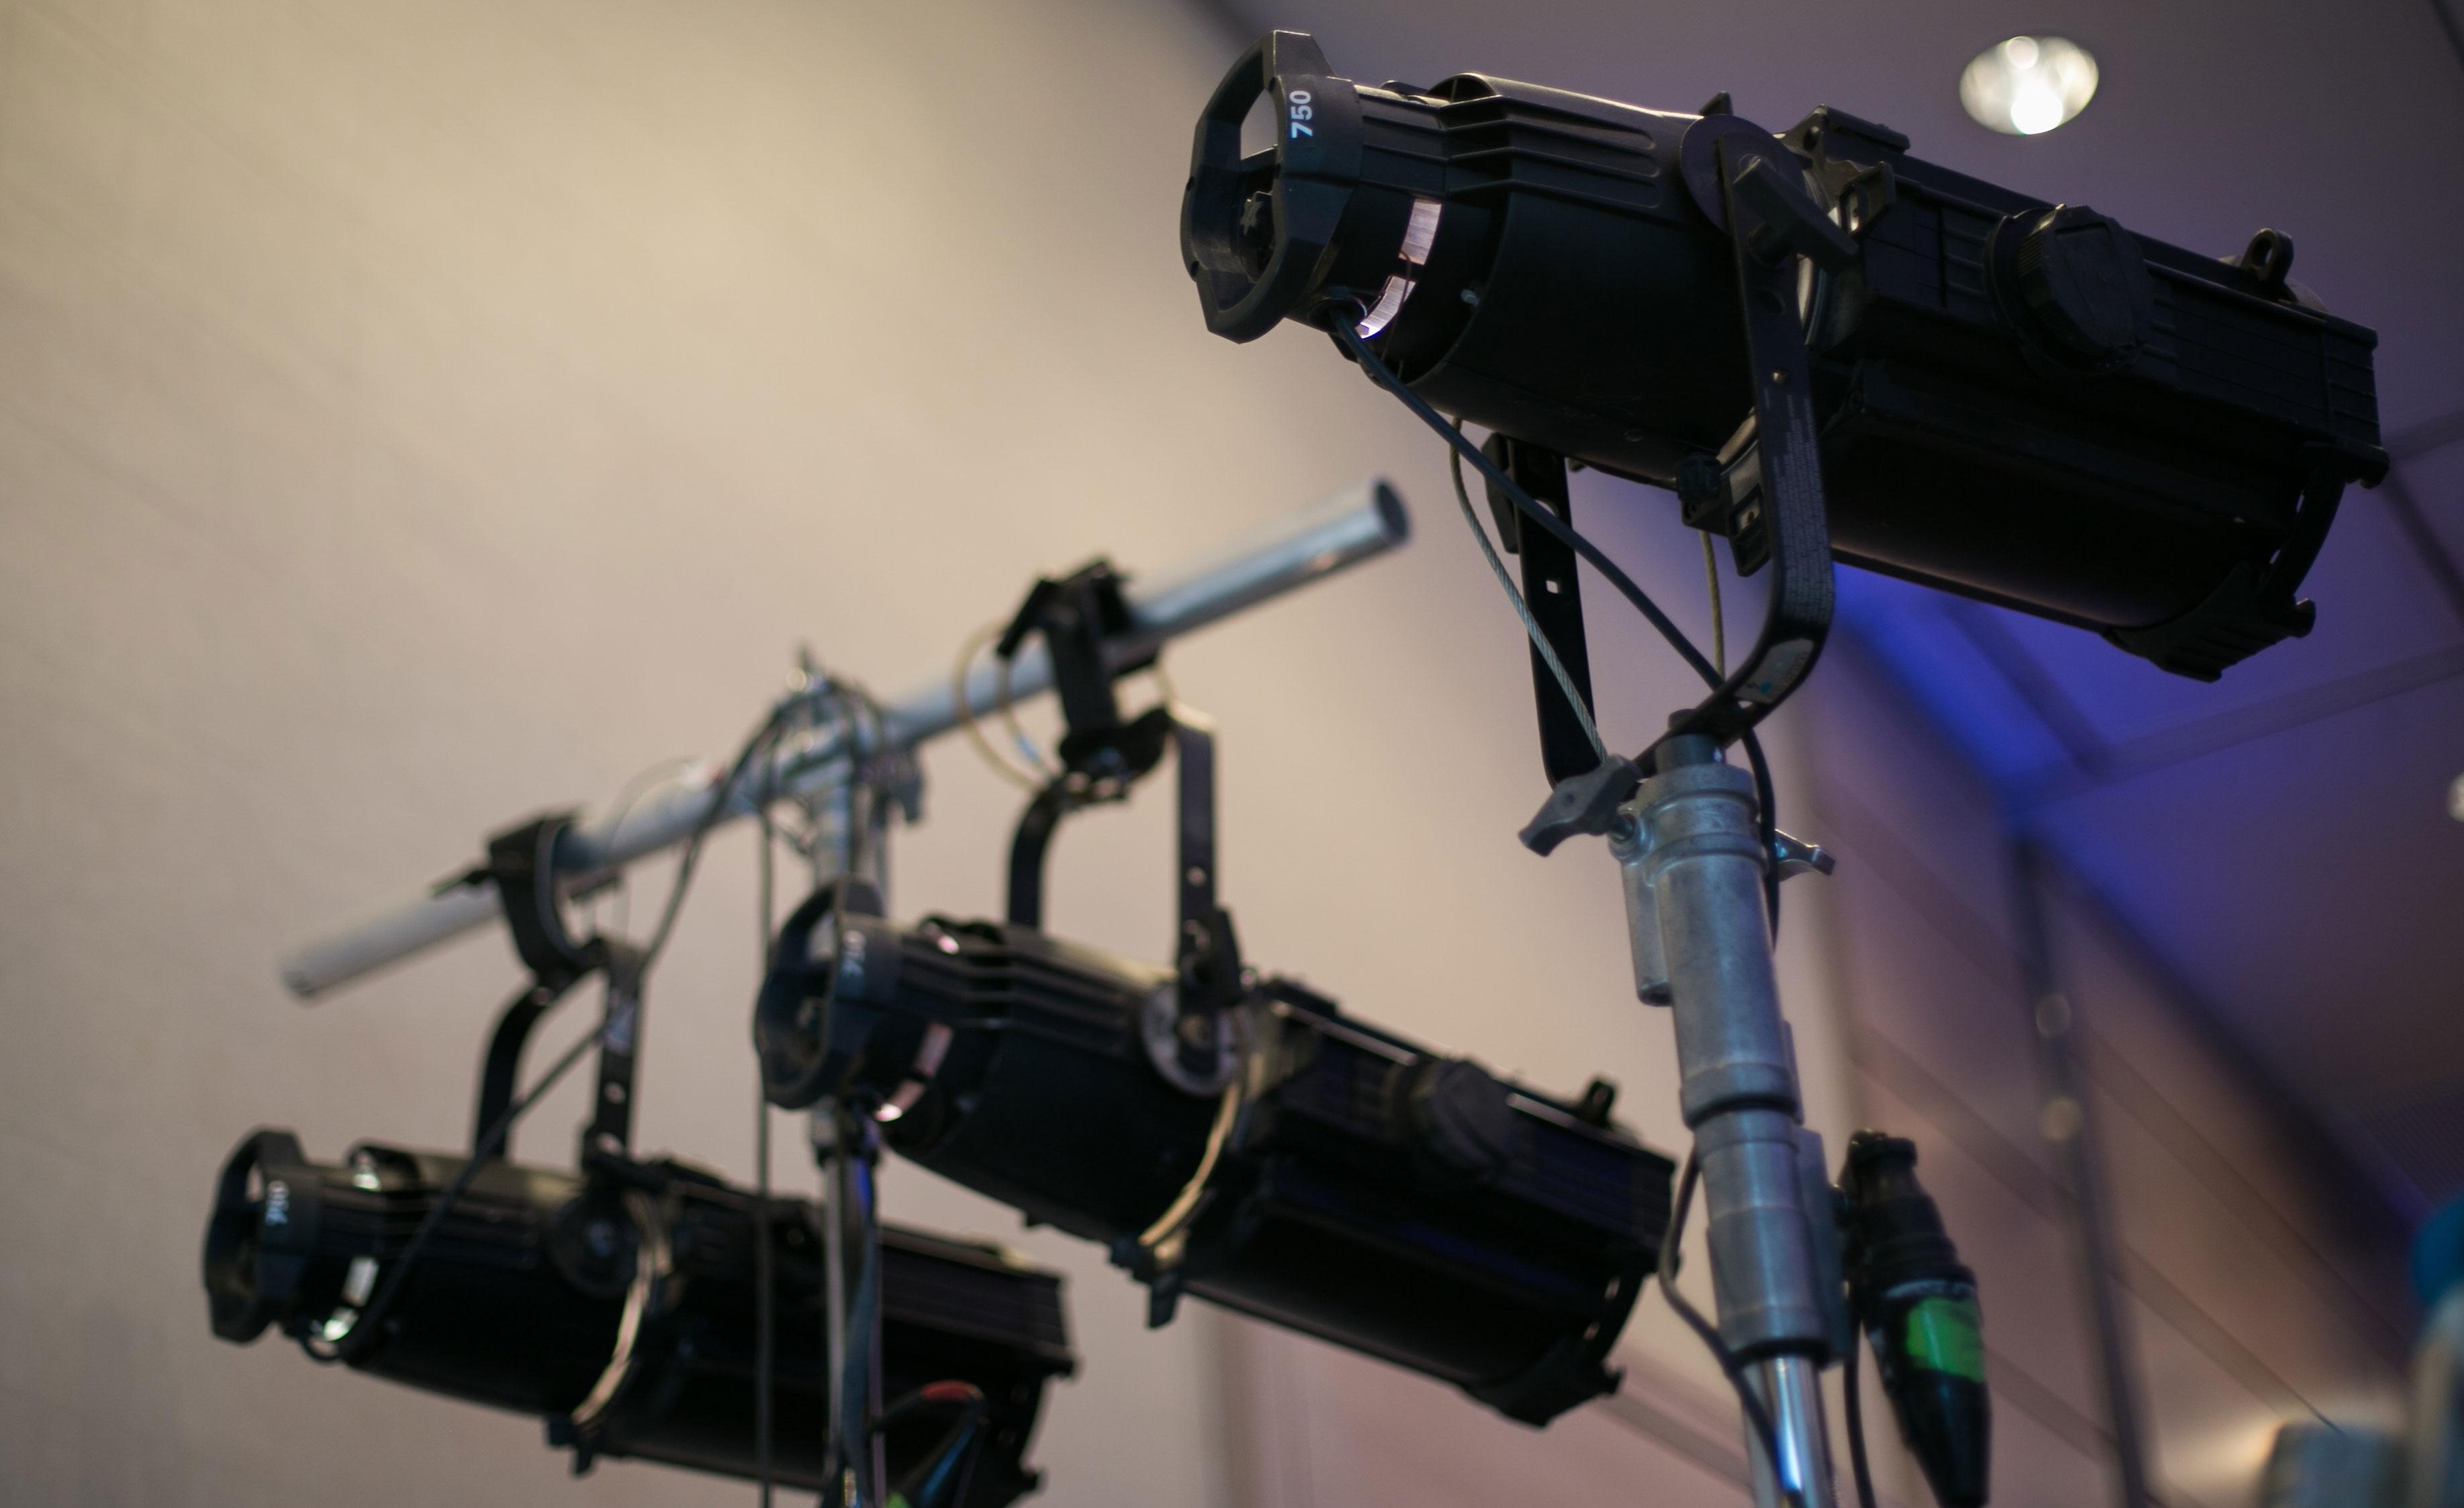 visuales, video, storytelling audiovisual, evento, agencia, creatividad, volando vengo